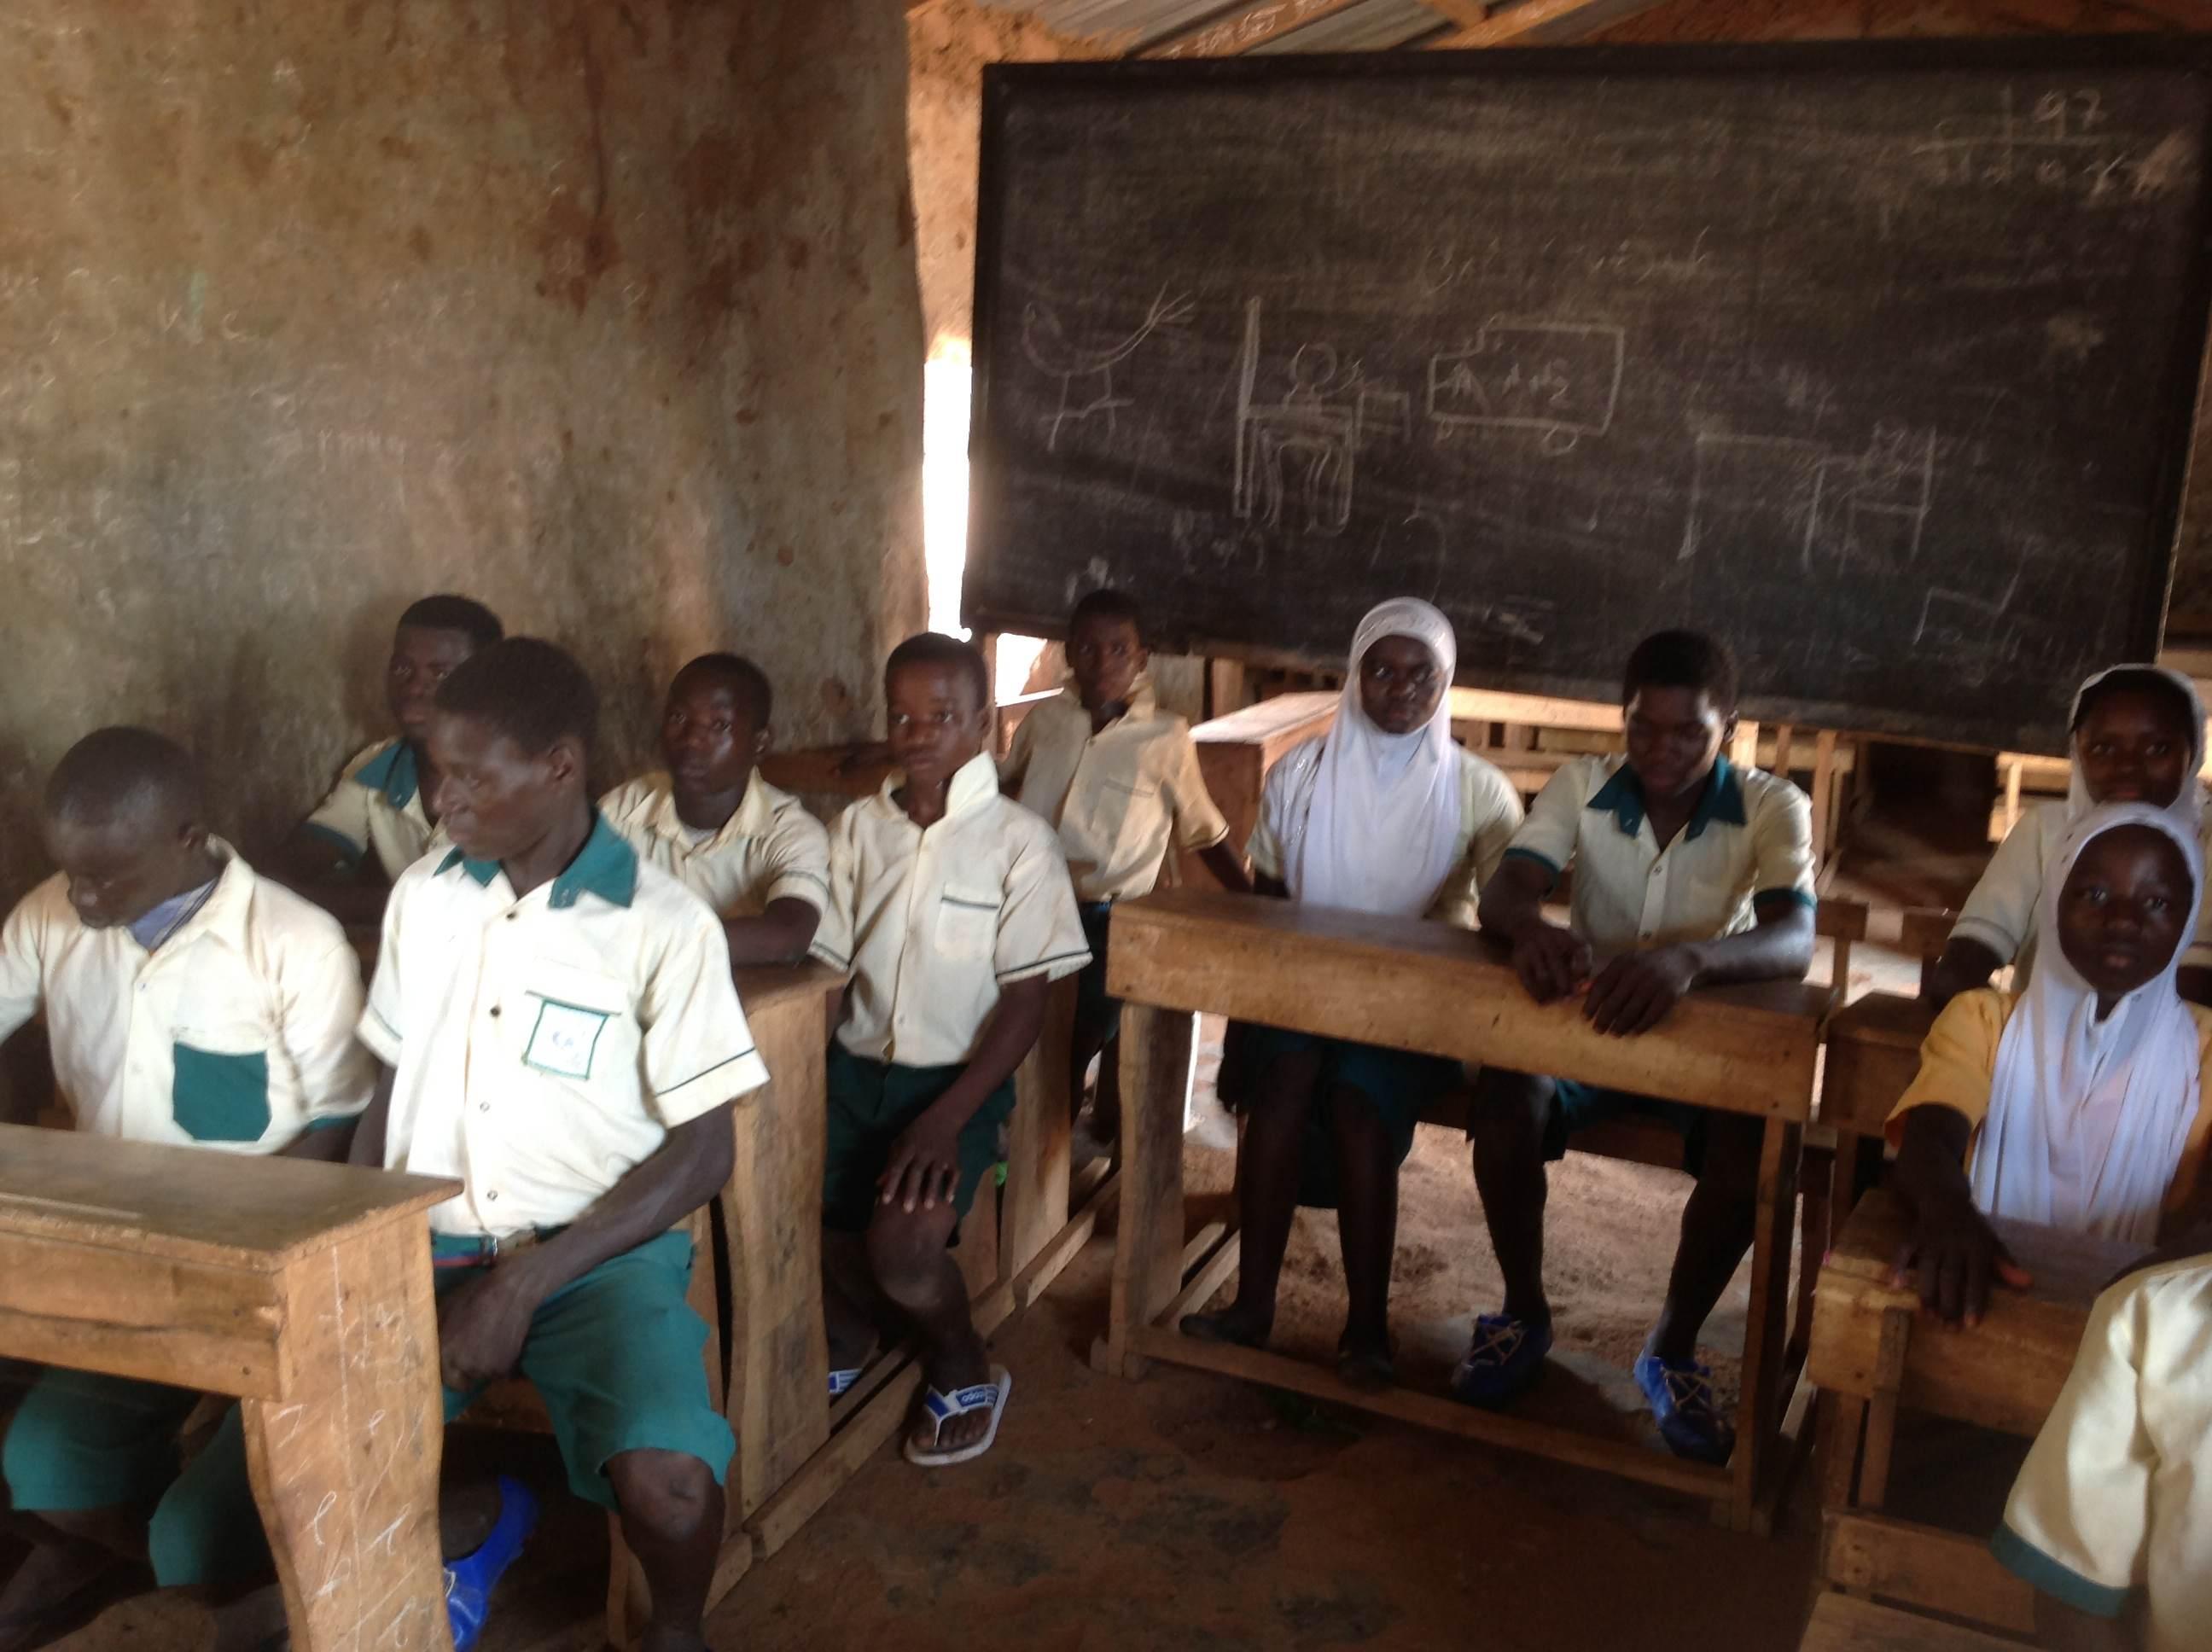 wpid-SCHOOL-KIDS.jpg